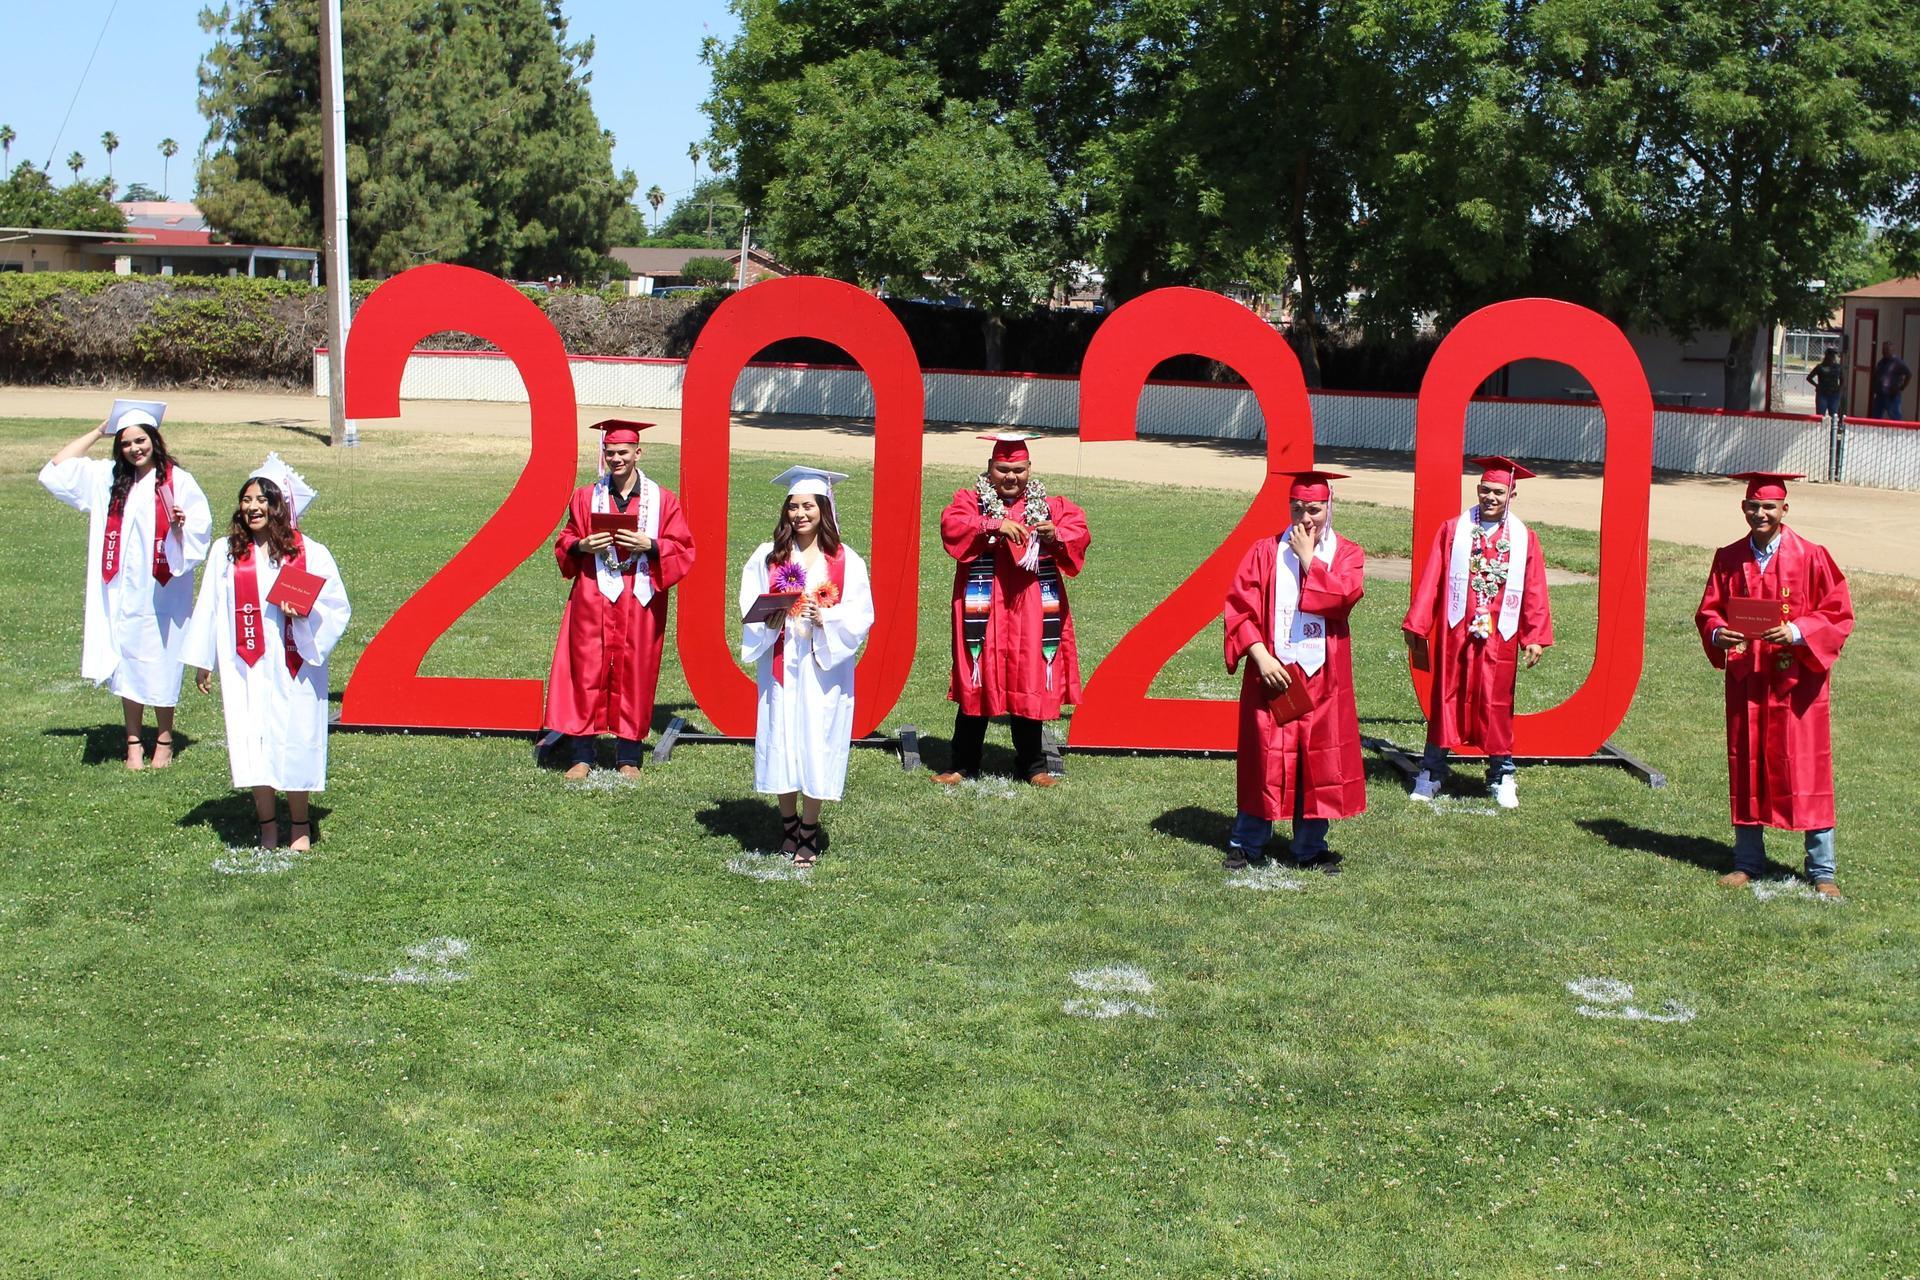 Left to right, Juliana Martinez, Jennifer Tapia, Francisco Partida, Marlyn Garcia, Israel Hernandez, Emanuel Rivas, Guillermo Flores, Juan Gonzalez-Ordaz turning their tassels